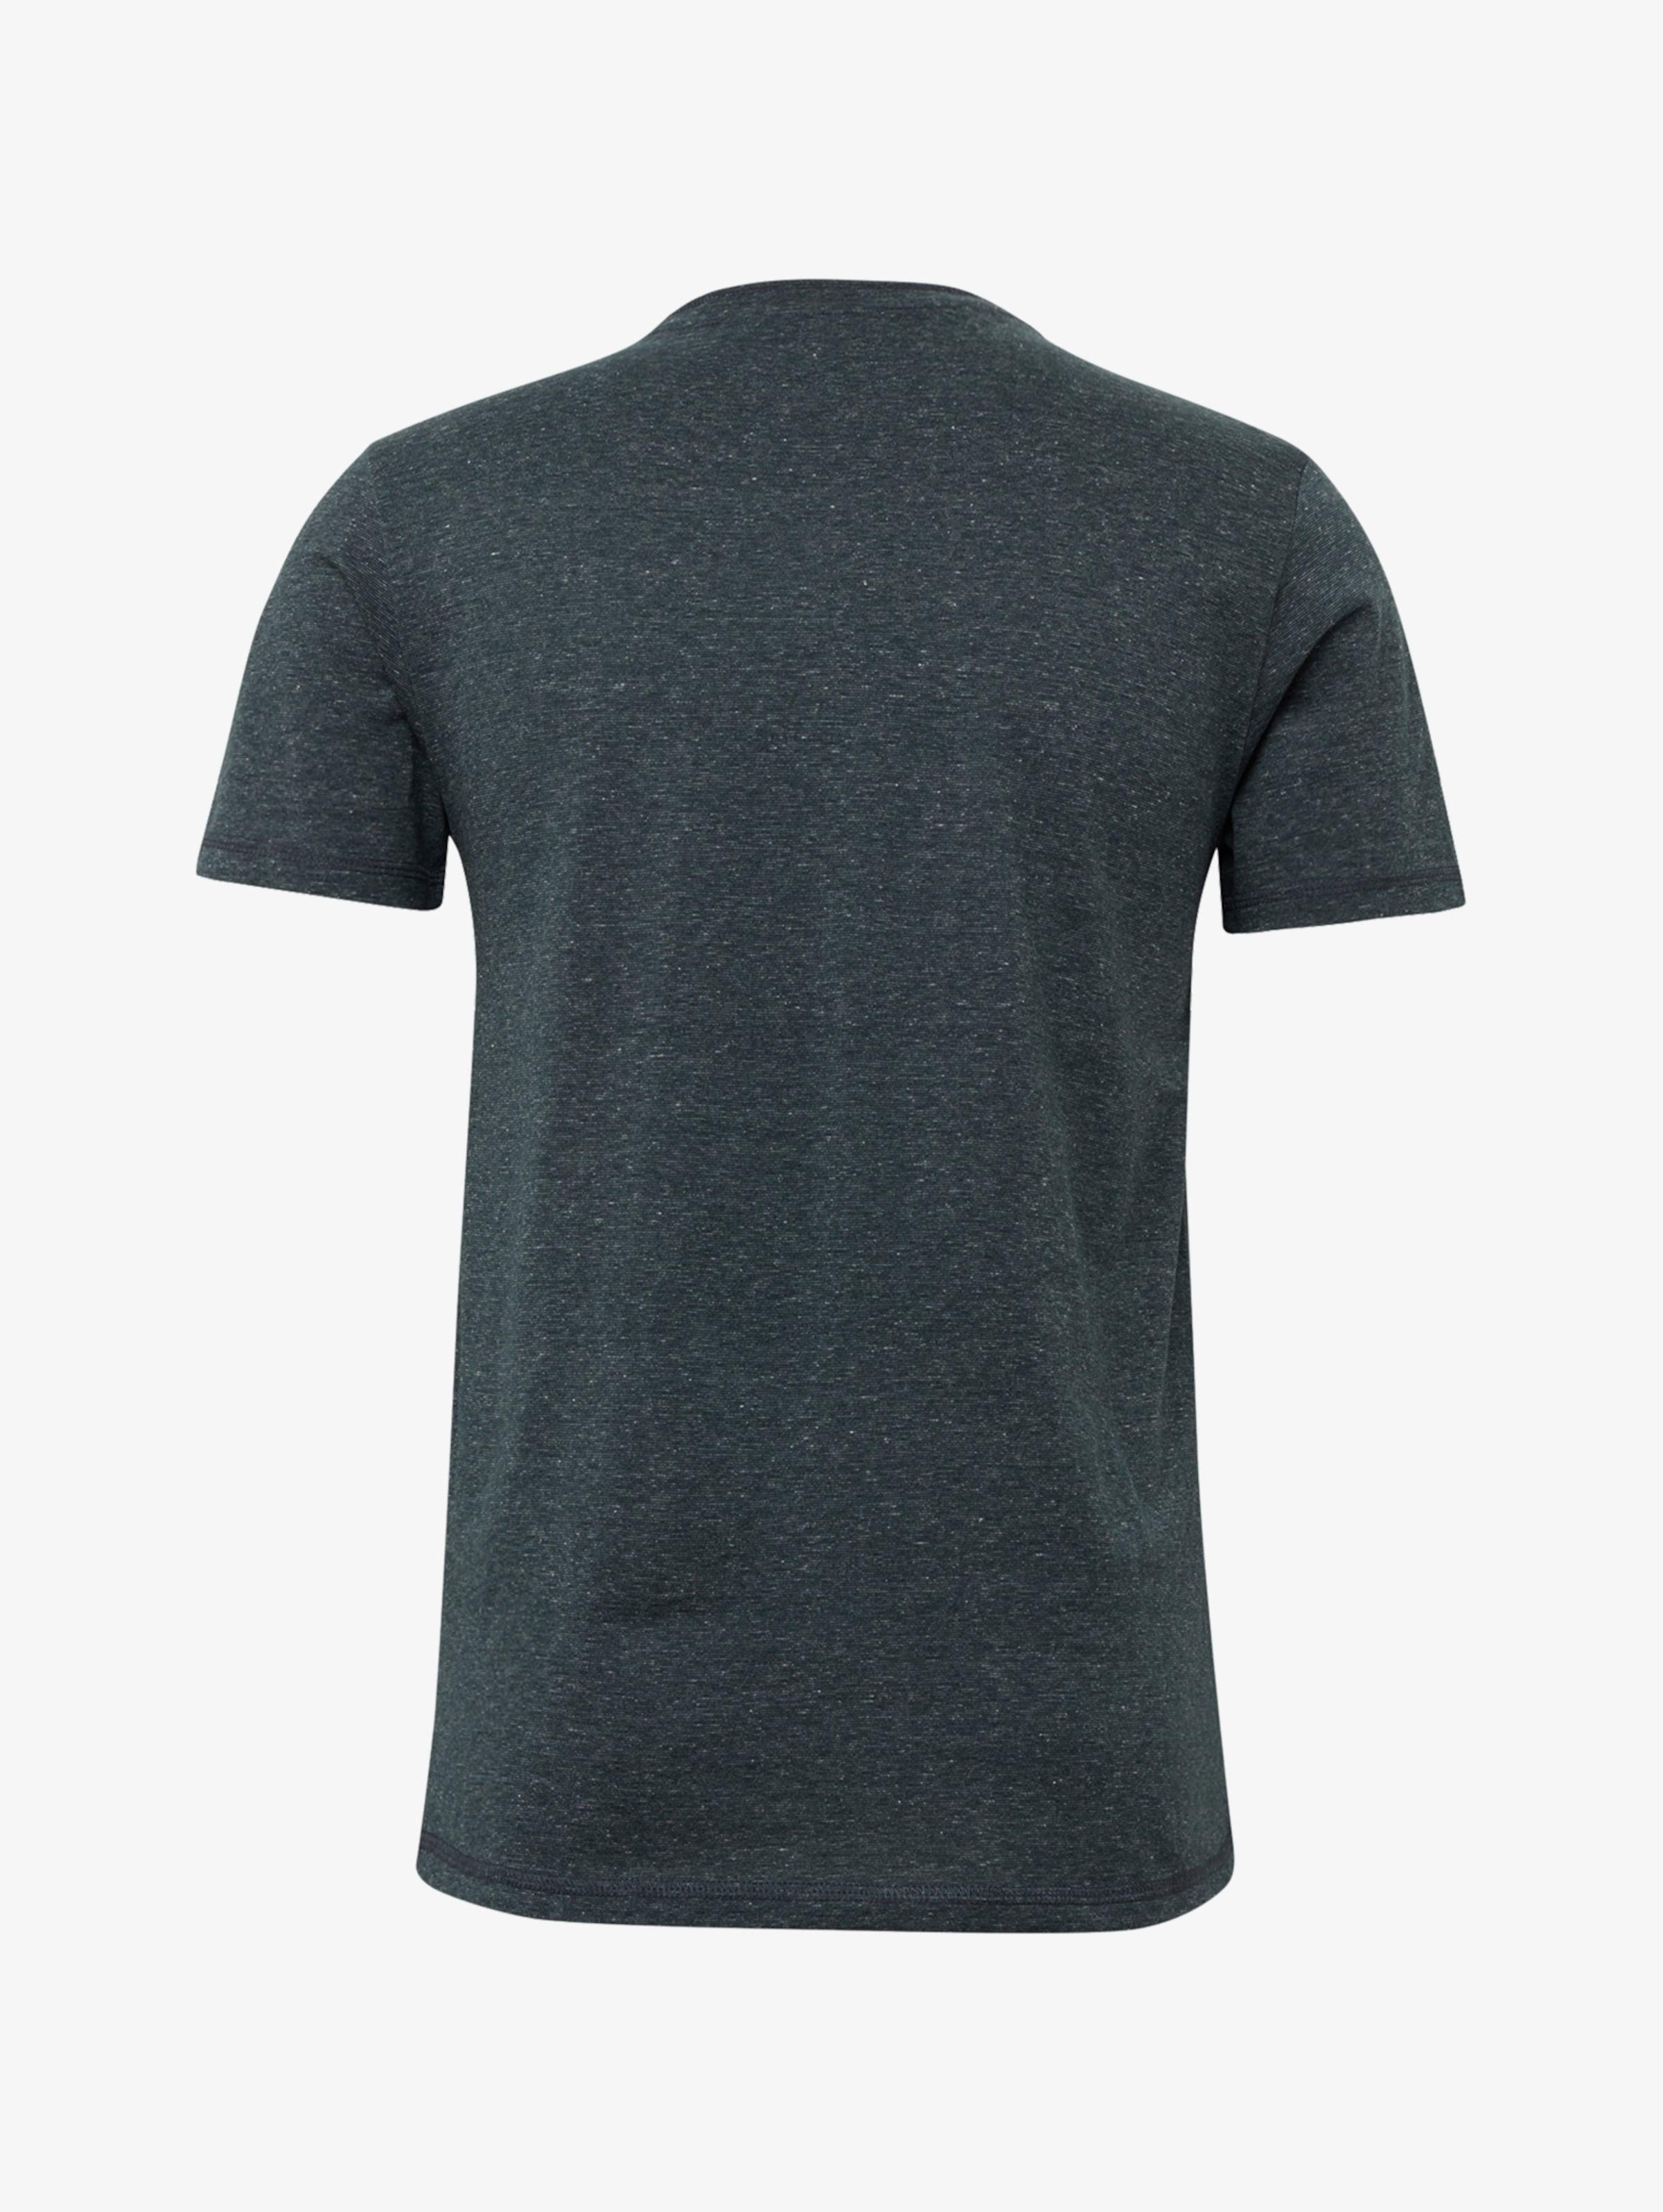 Smaragd shirt Tailor T Denim In Tom IY9WDHE2